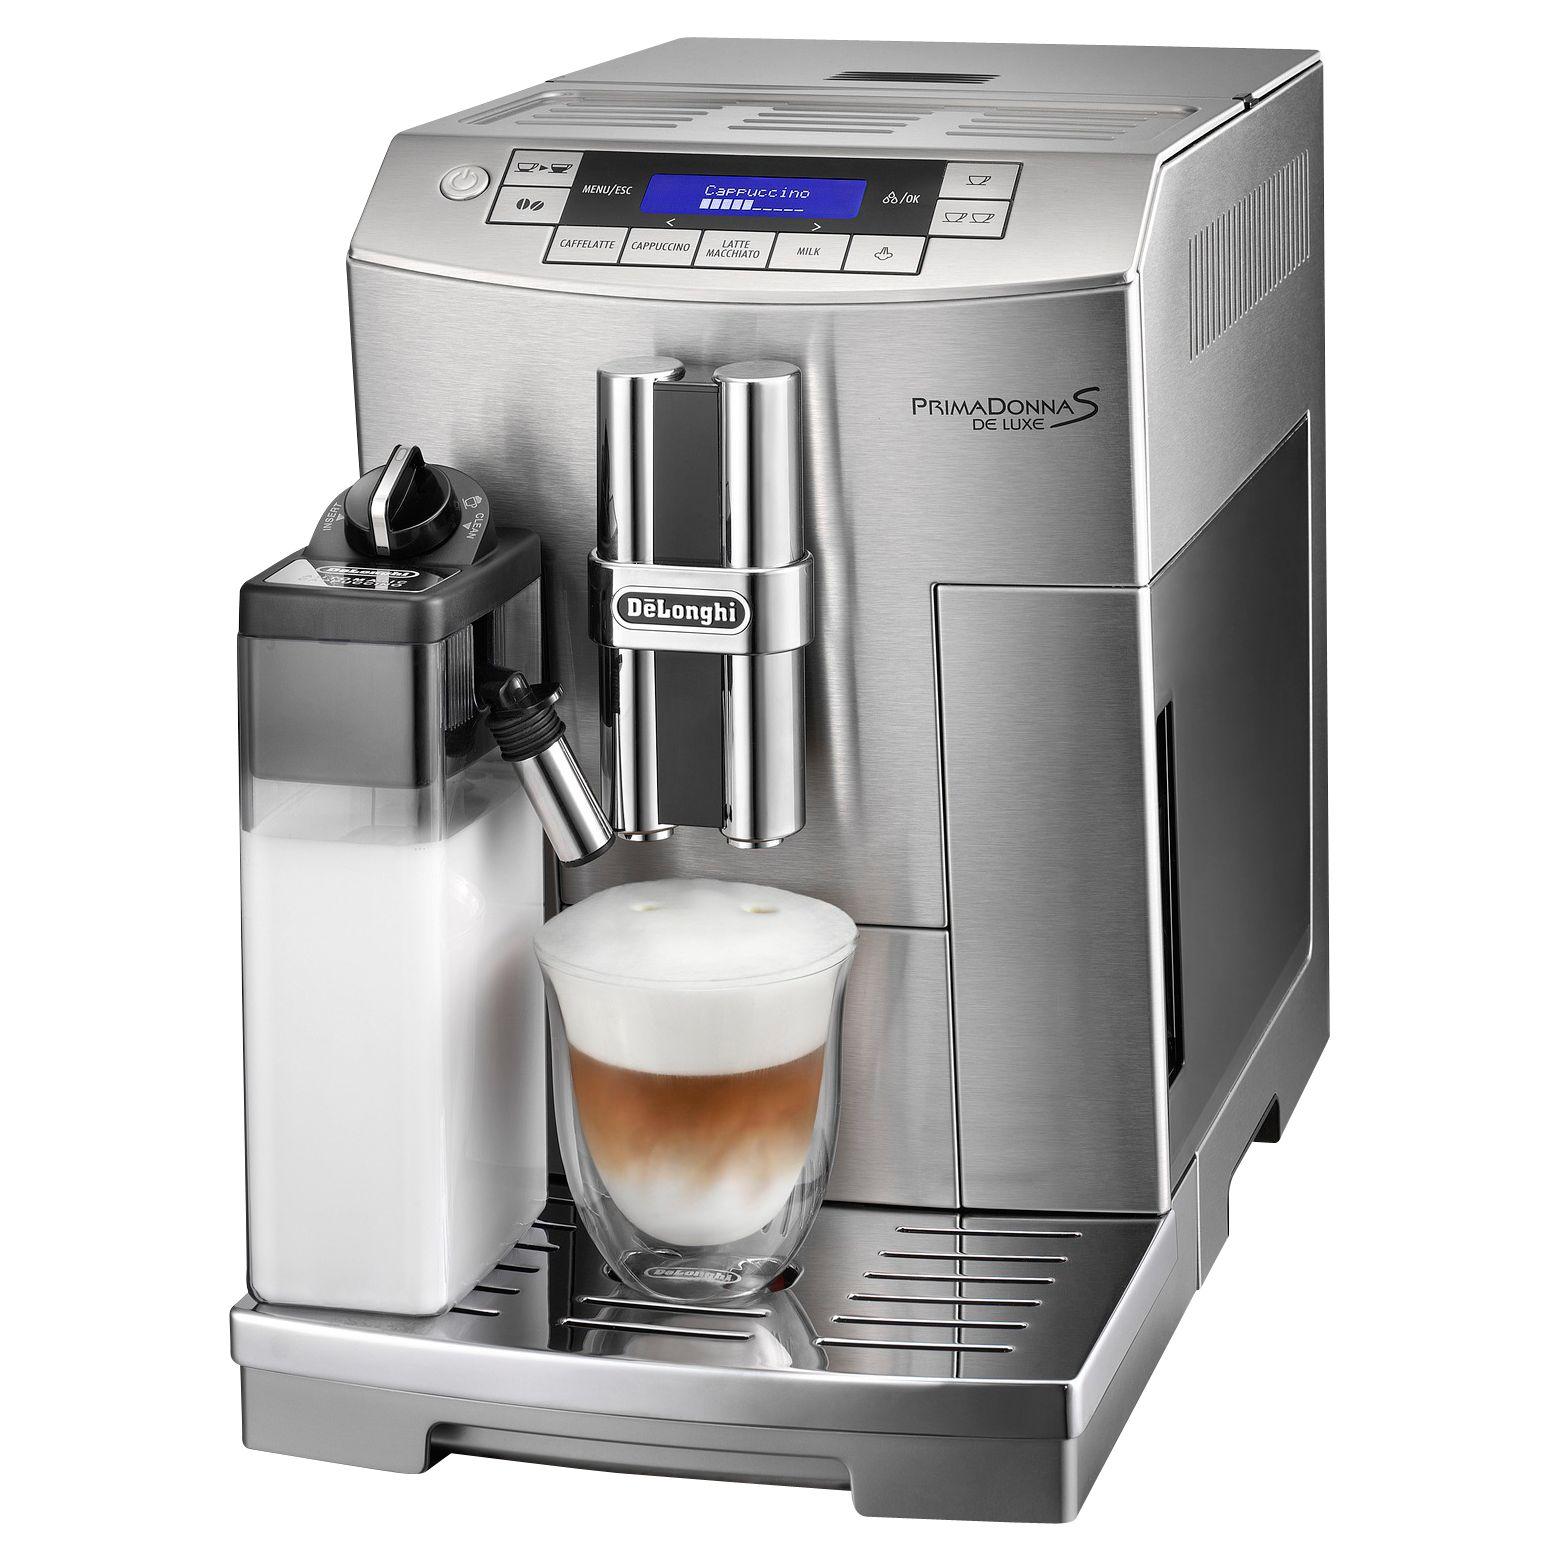 Electronic Prima Donna Delonghi Coffee Machine buy delonghi ecam28 465 m prima donna s deluxe bean to cup coffee to